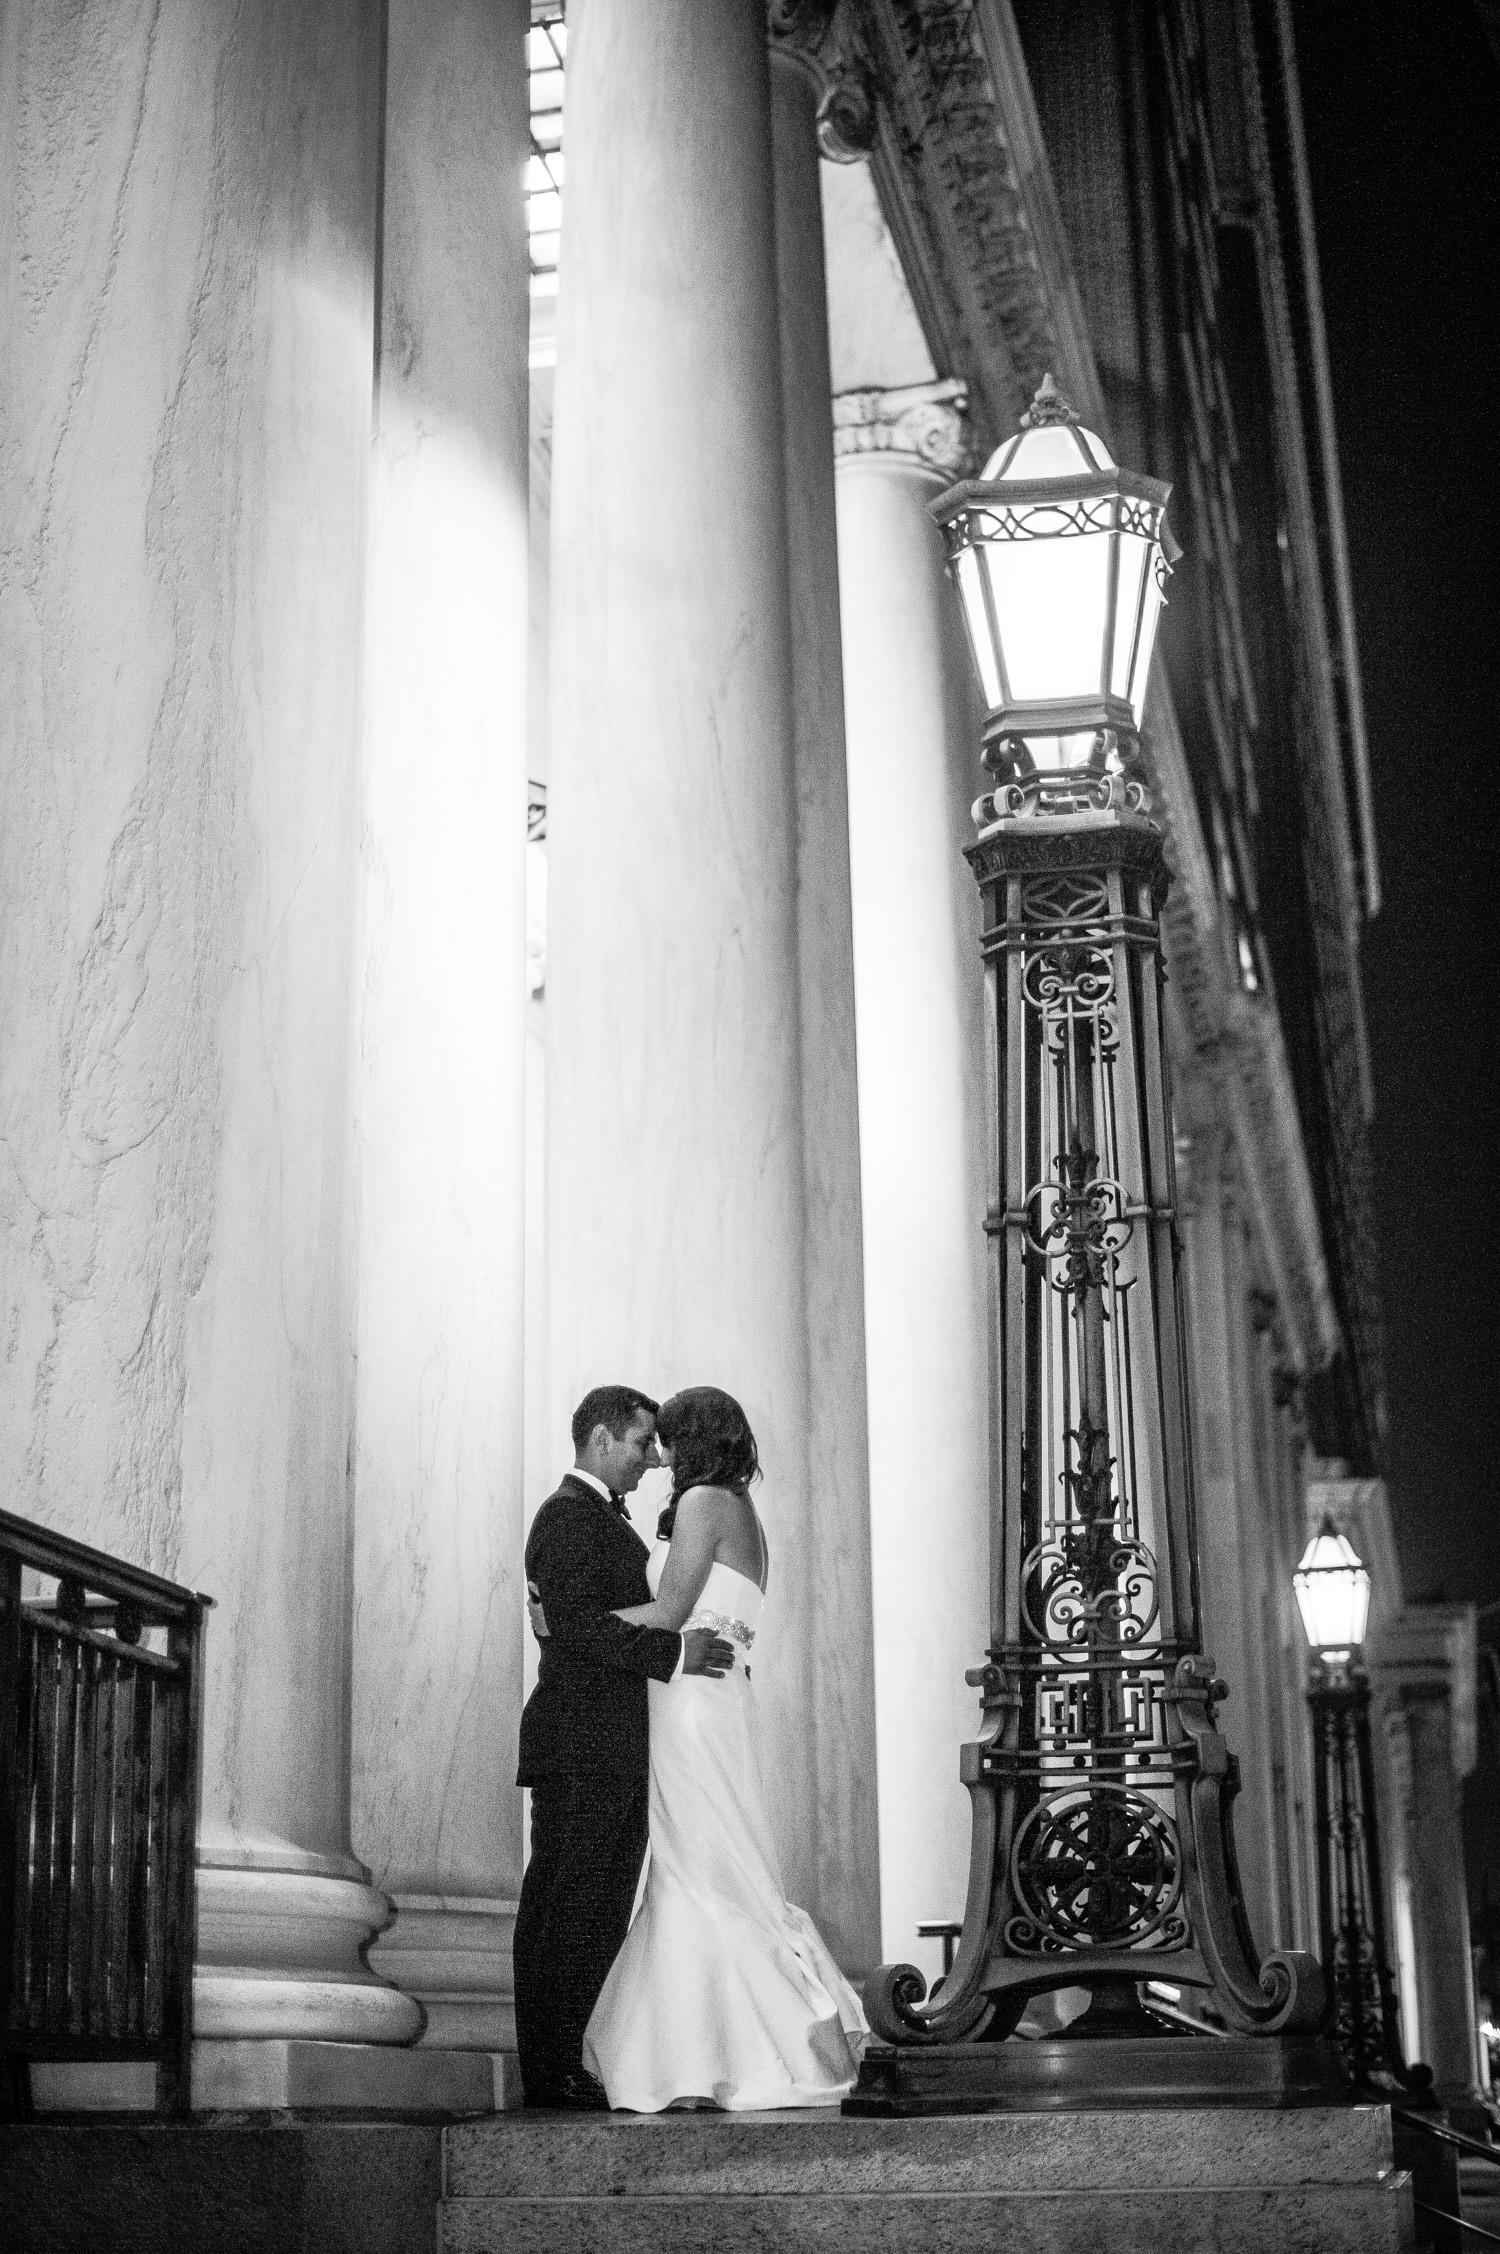 the-downtown-club-philadelphia-wedding-29.jpg